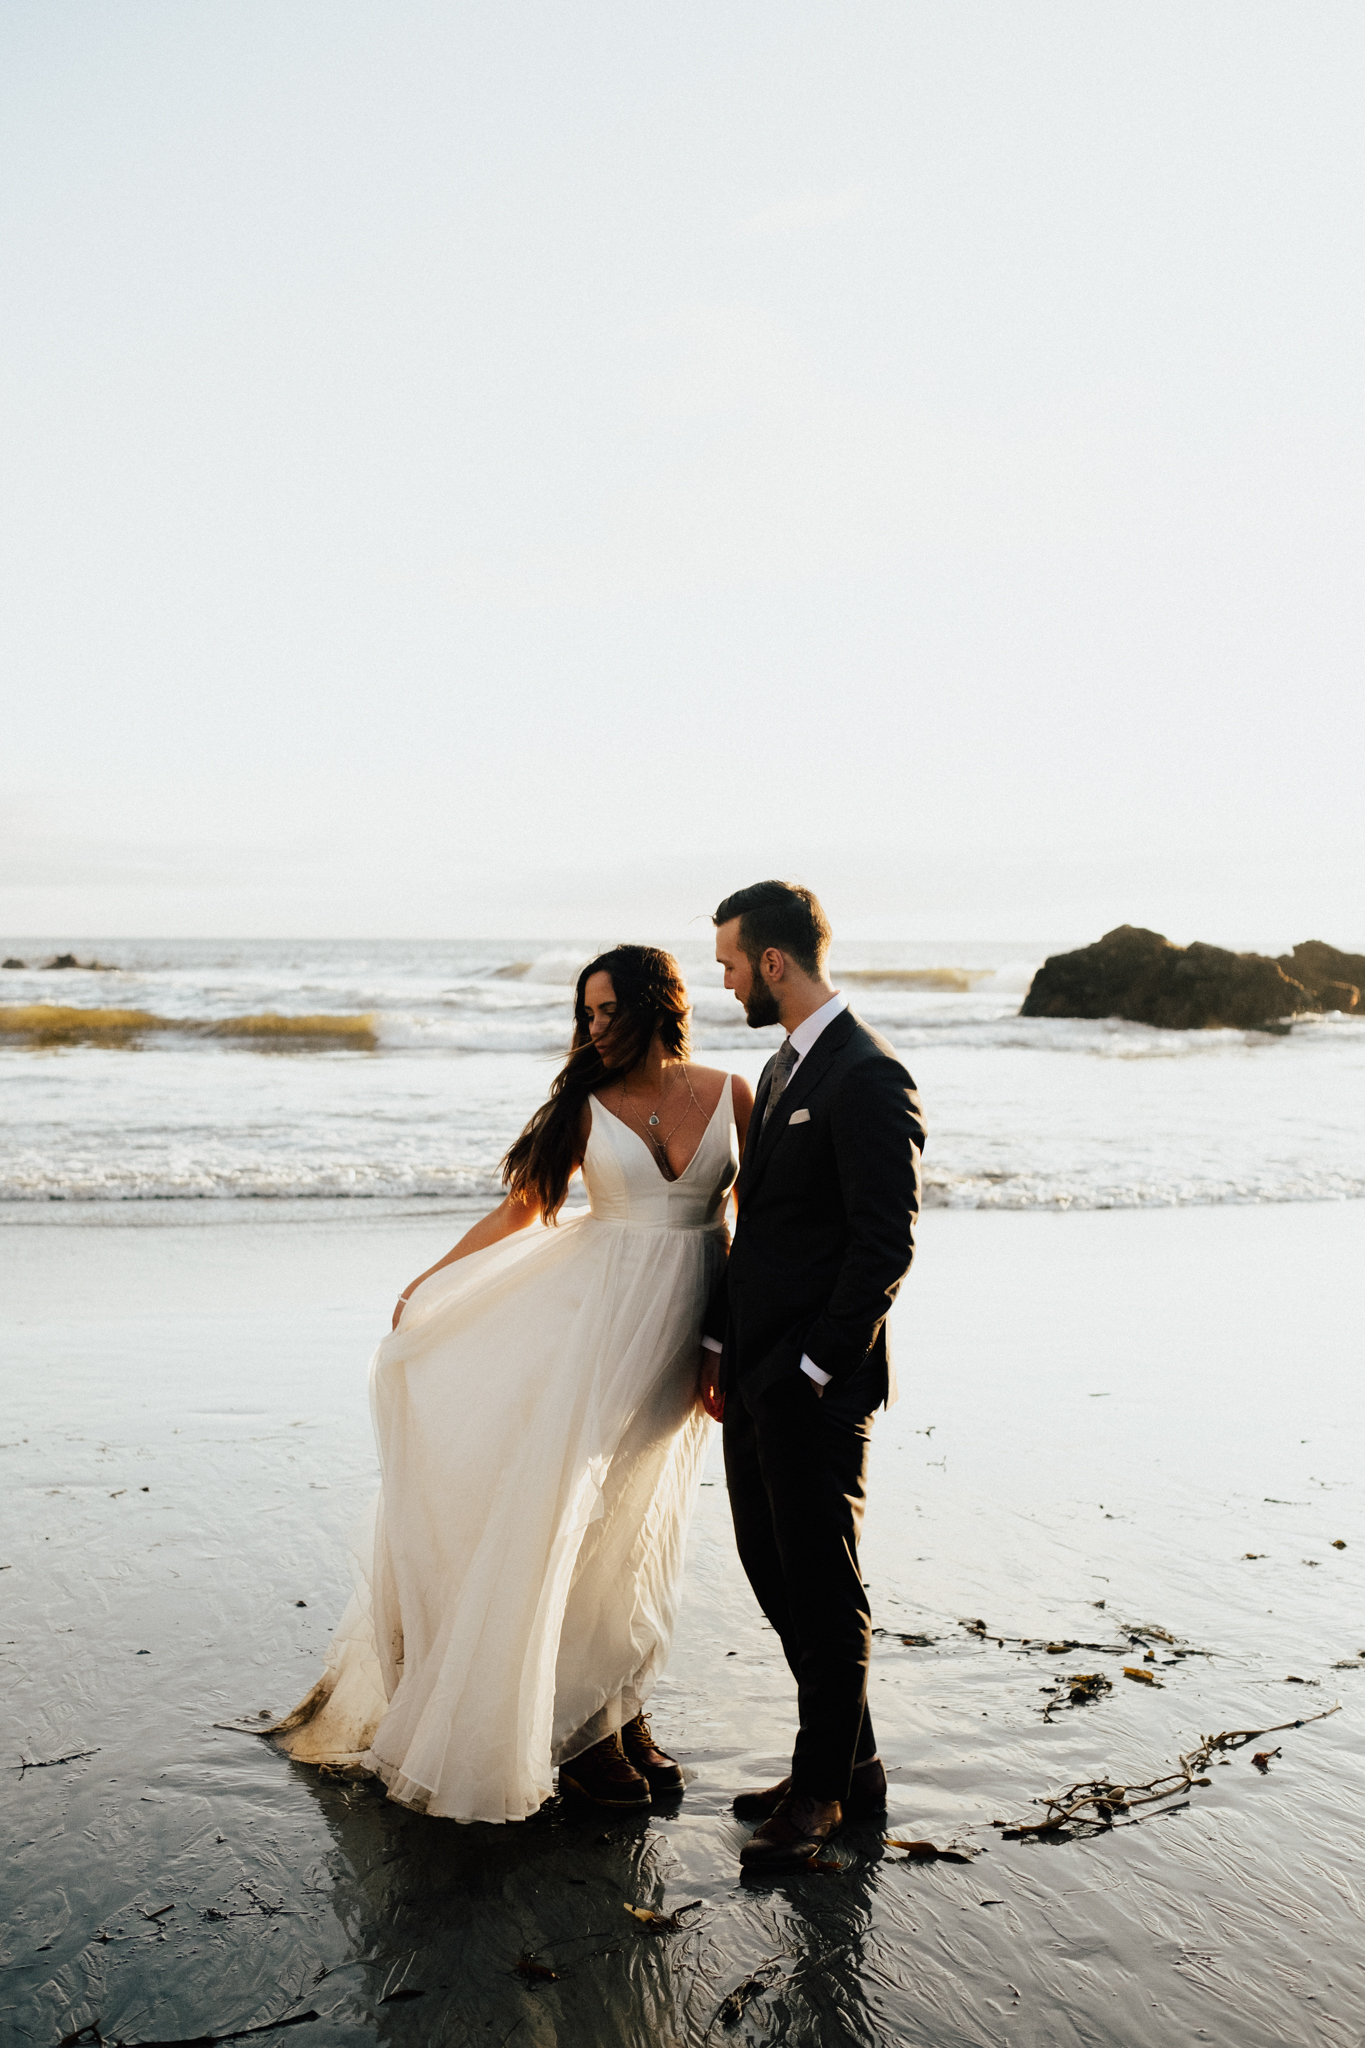 Arizona-Adventure-Elopement-Wedding-Photographer-22.jpg